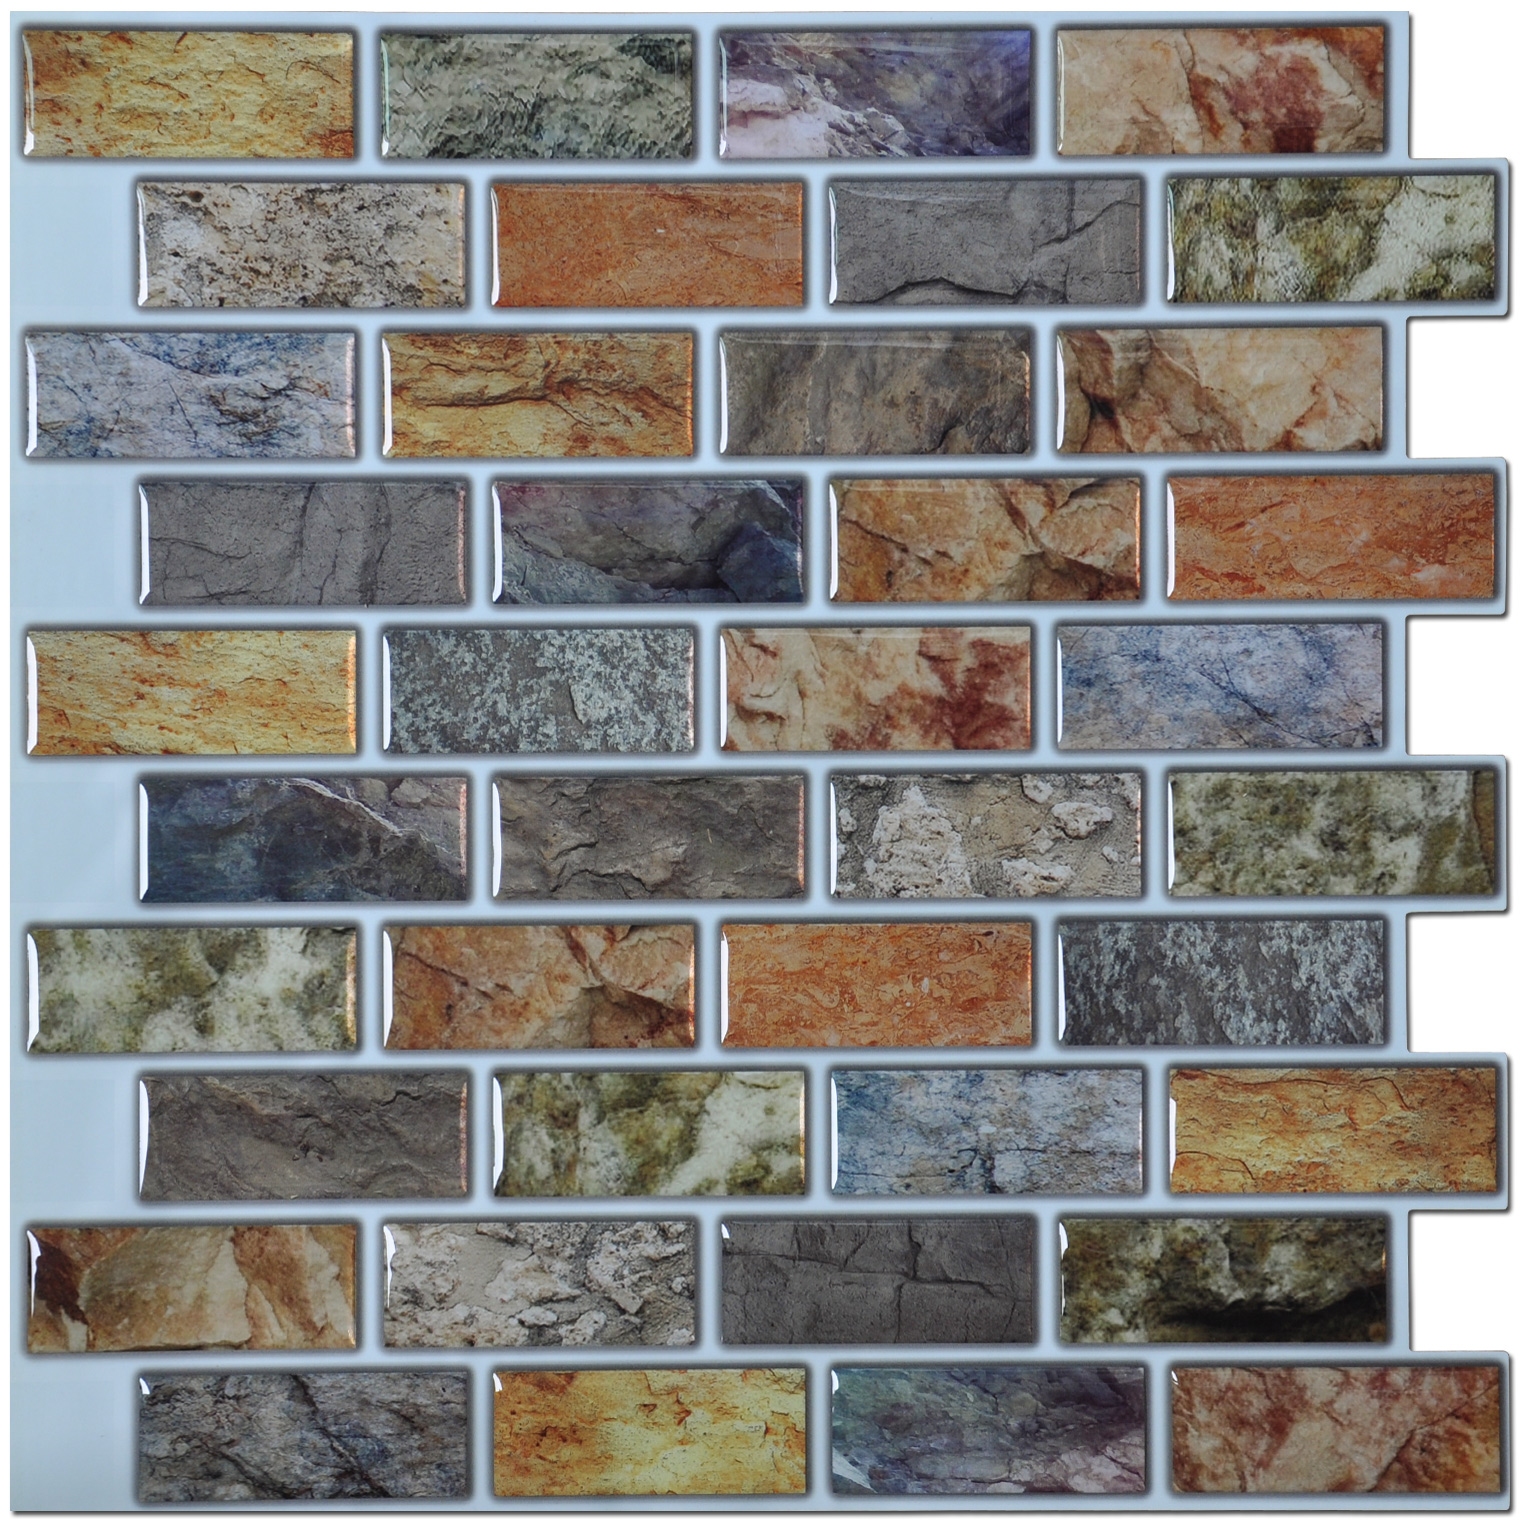 Art3d Backsplash Peel N Stick Tiles Kitchen Bathroom Backsplash